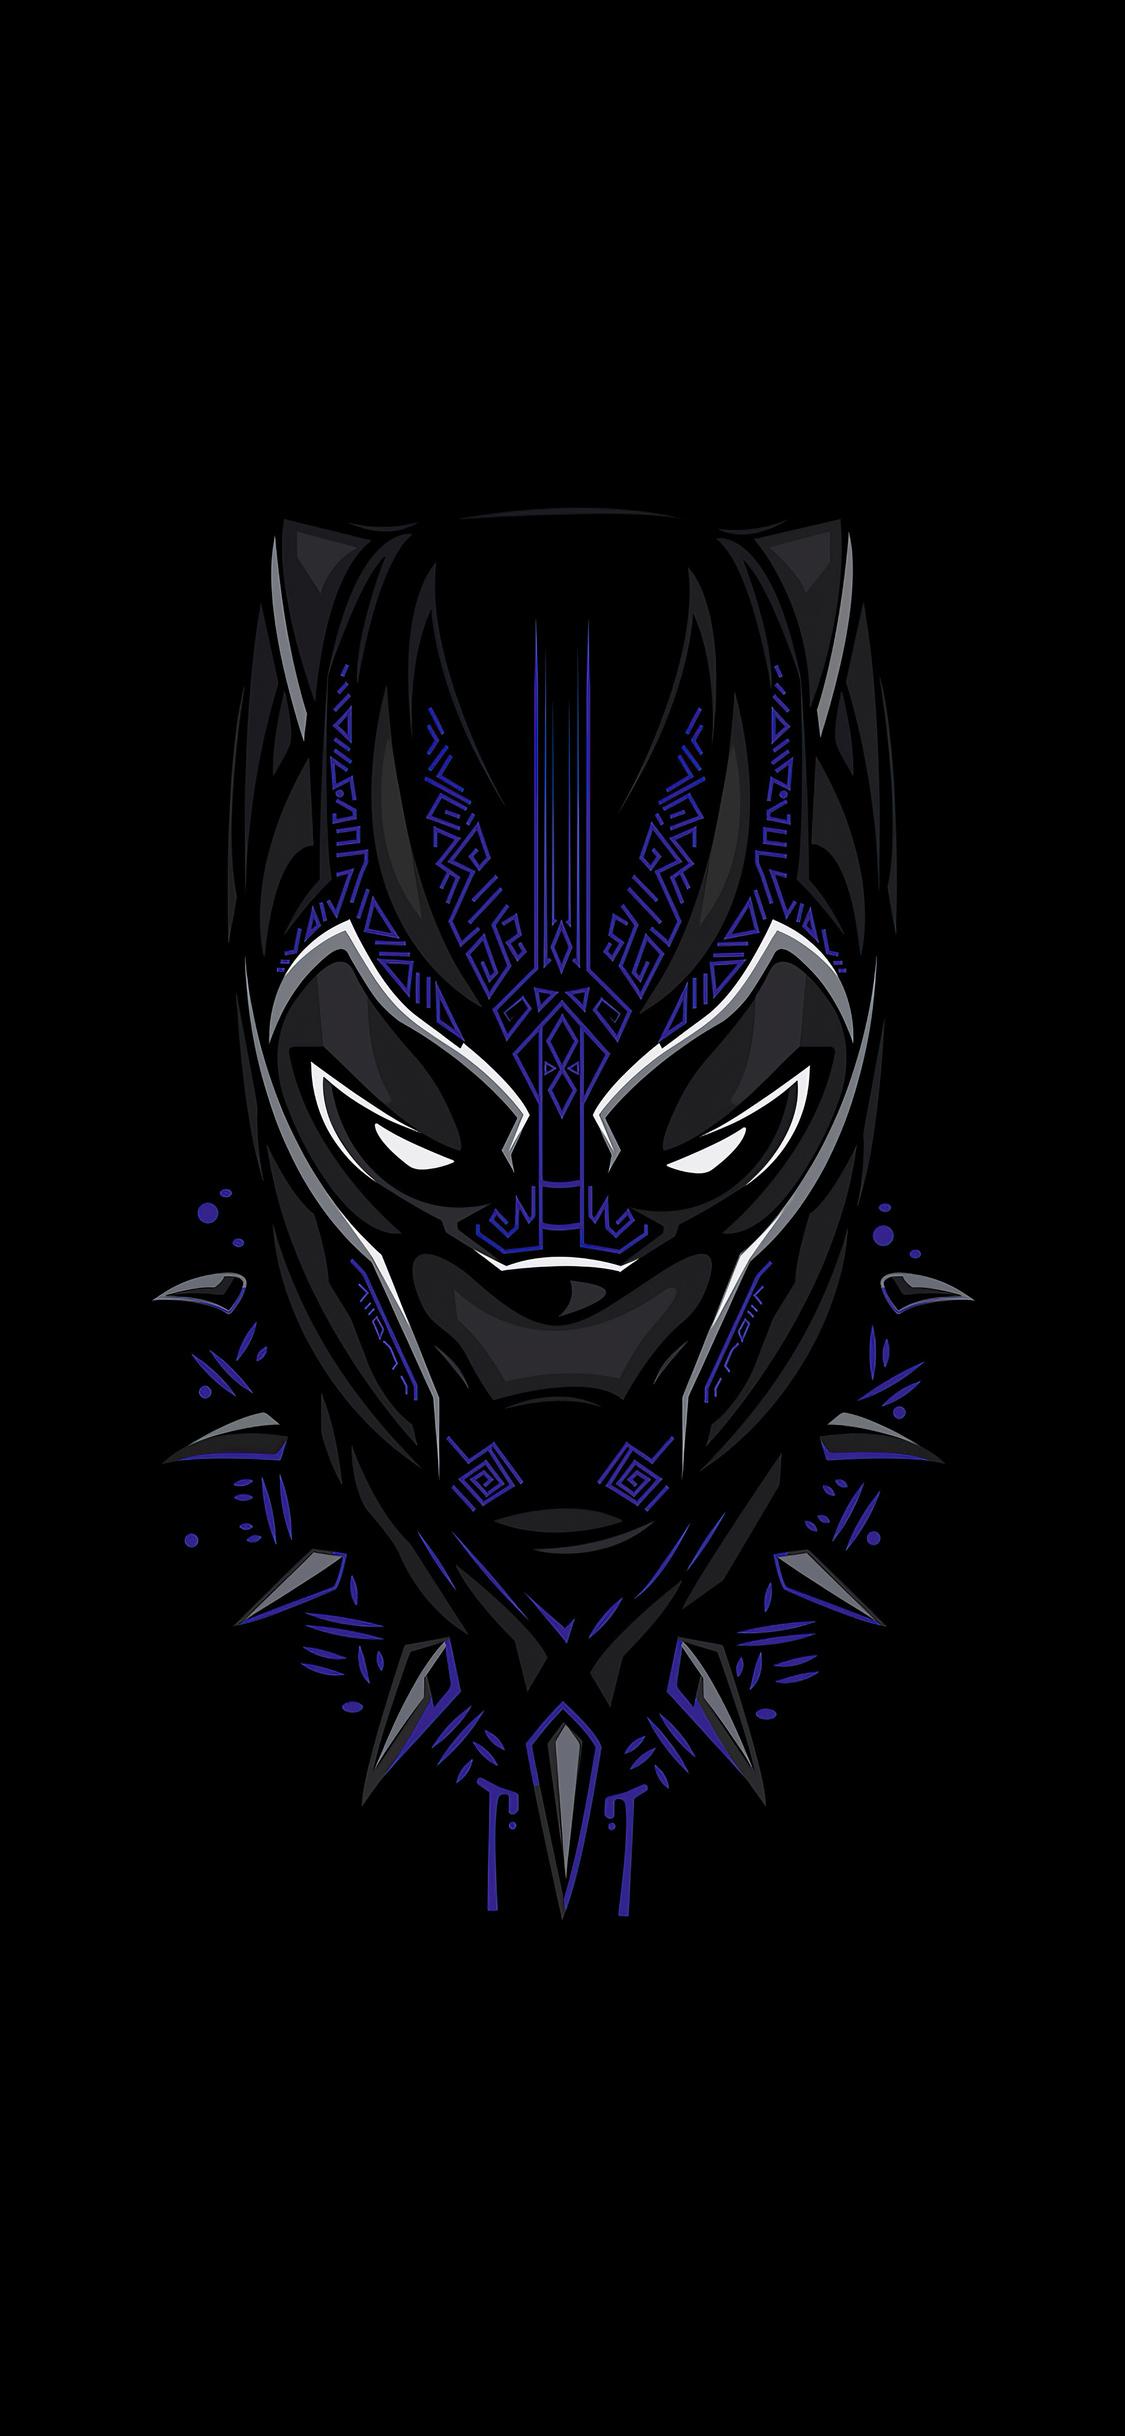 1125x2436 Black Panther 4k Minimalism 2020 Iphone XS ...